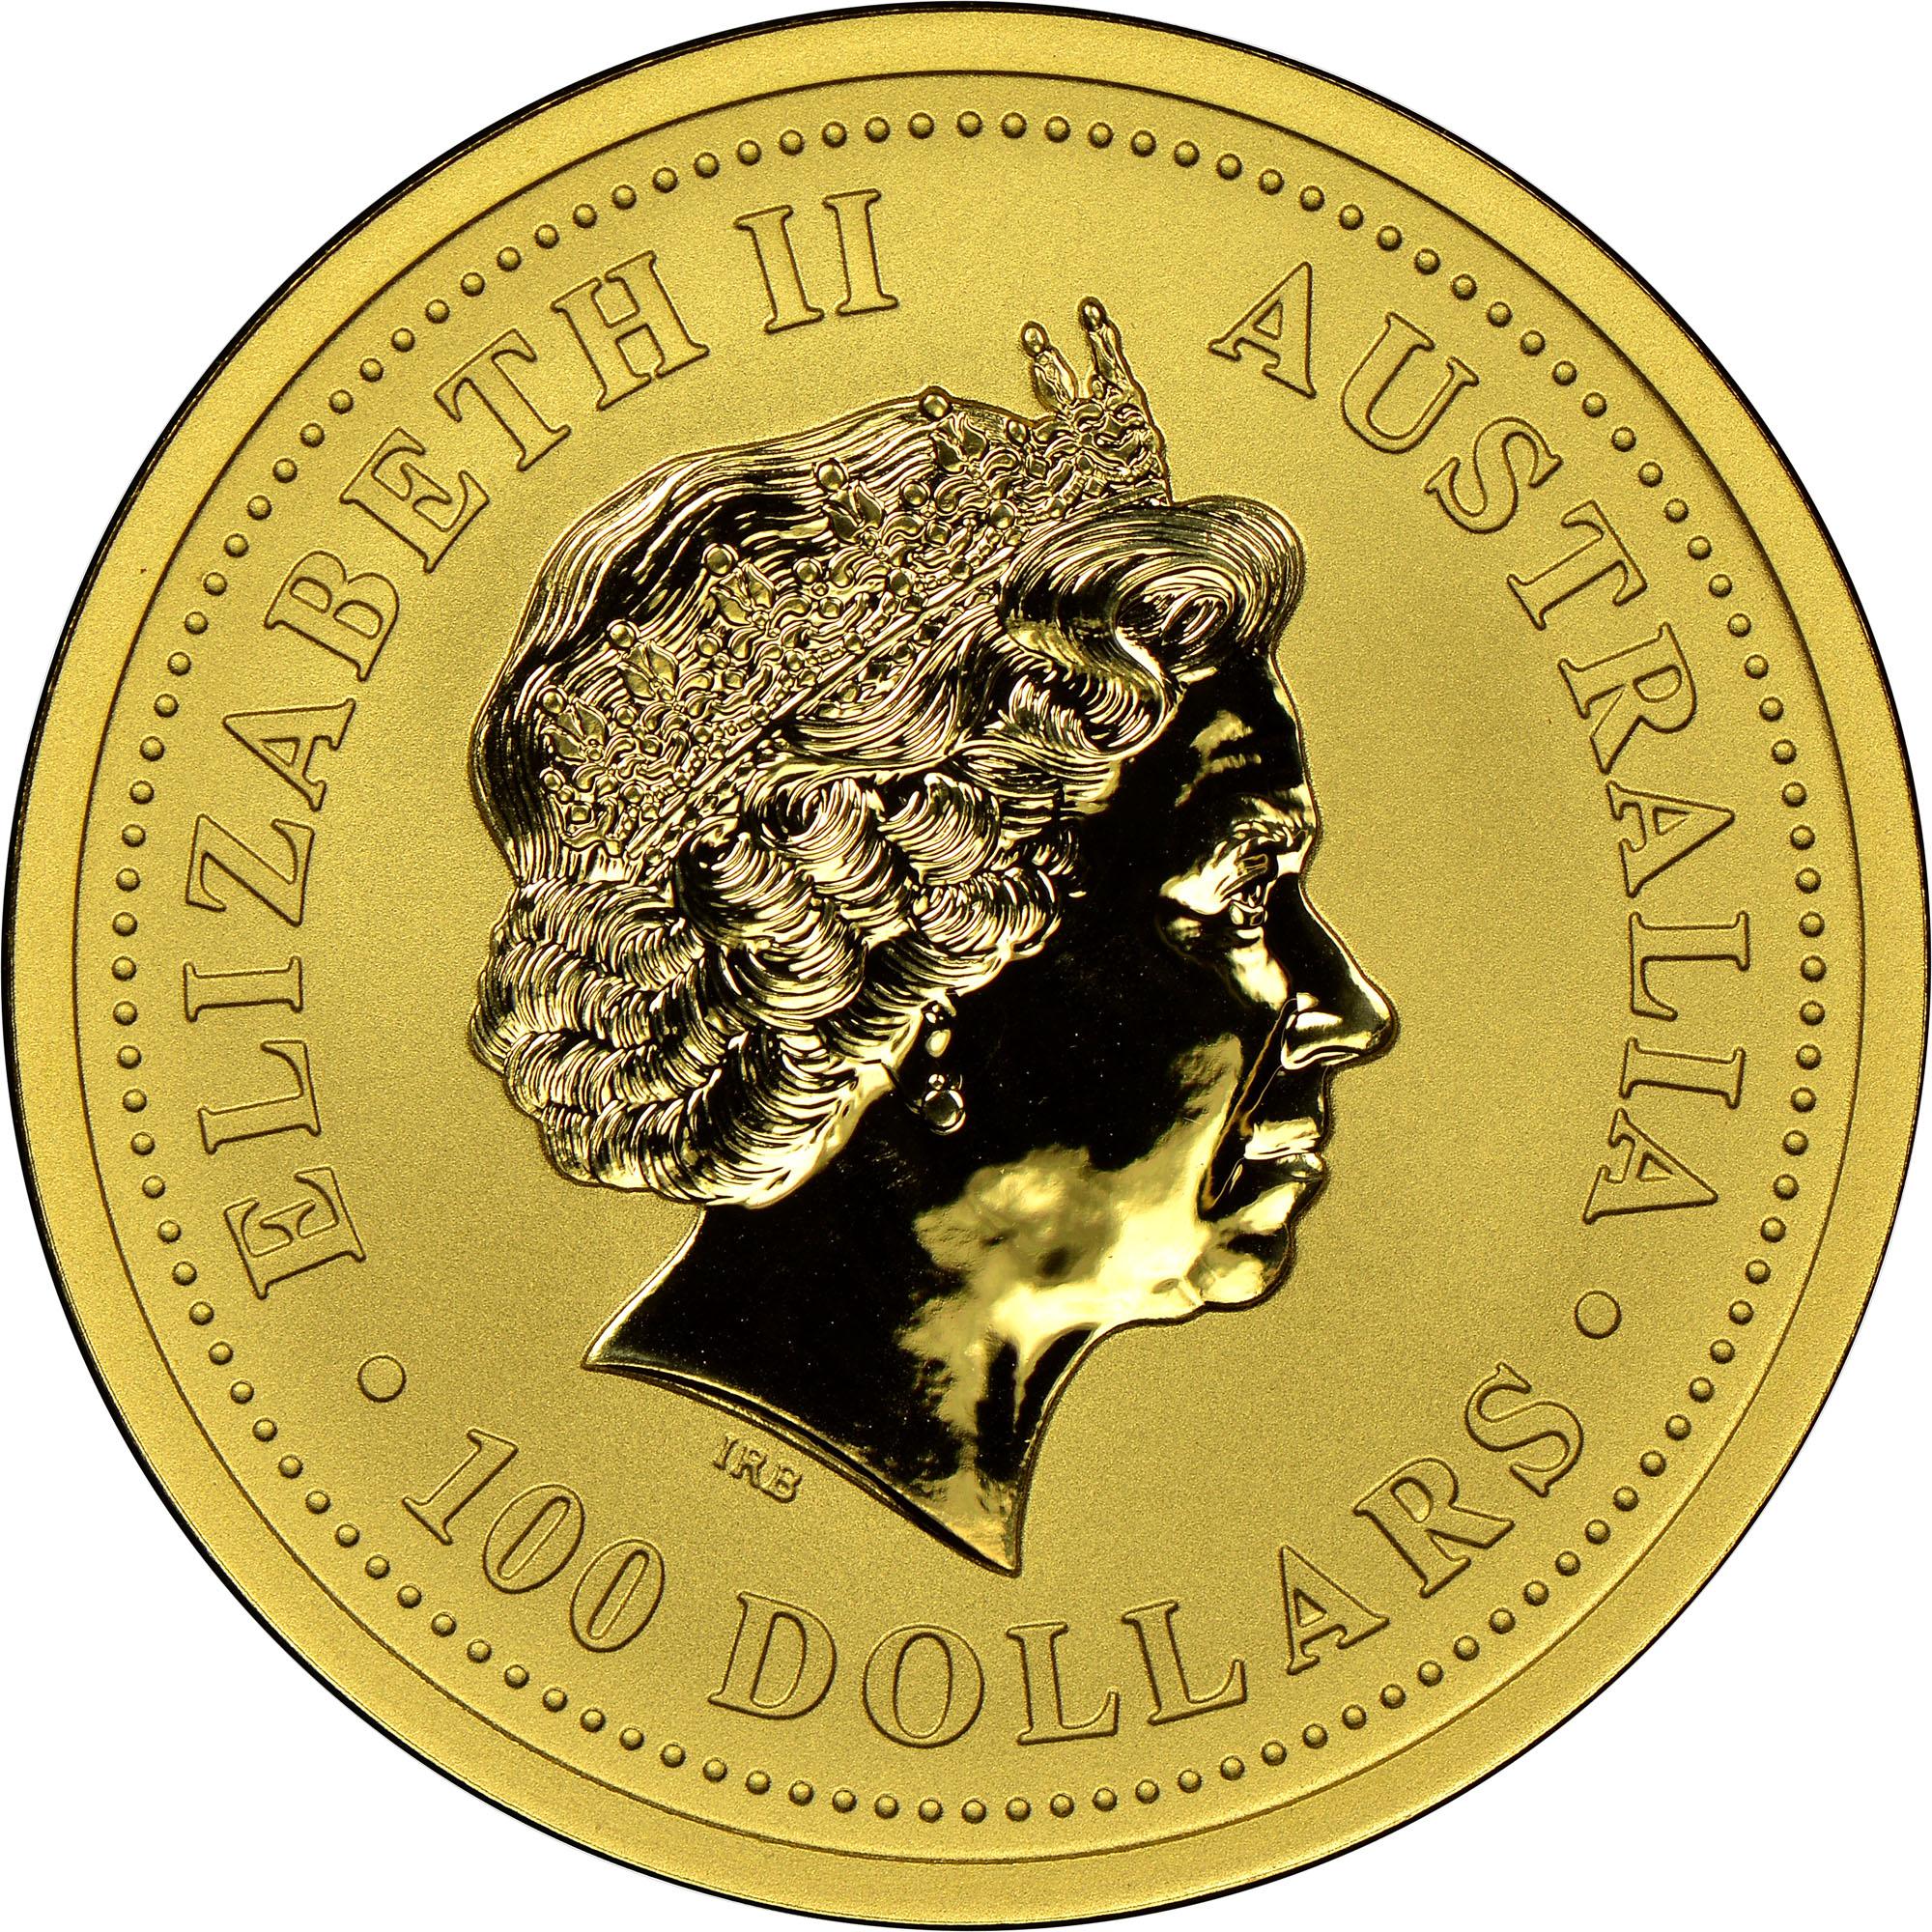 1999 Australia 100 Dollars obverse